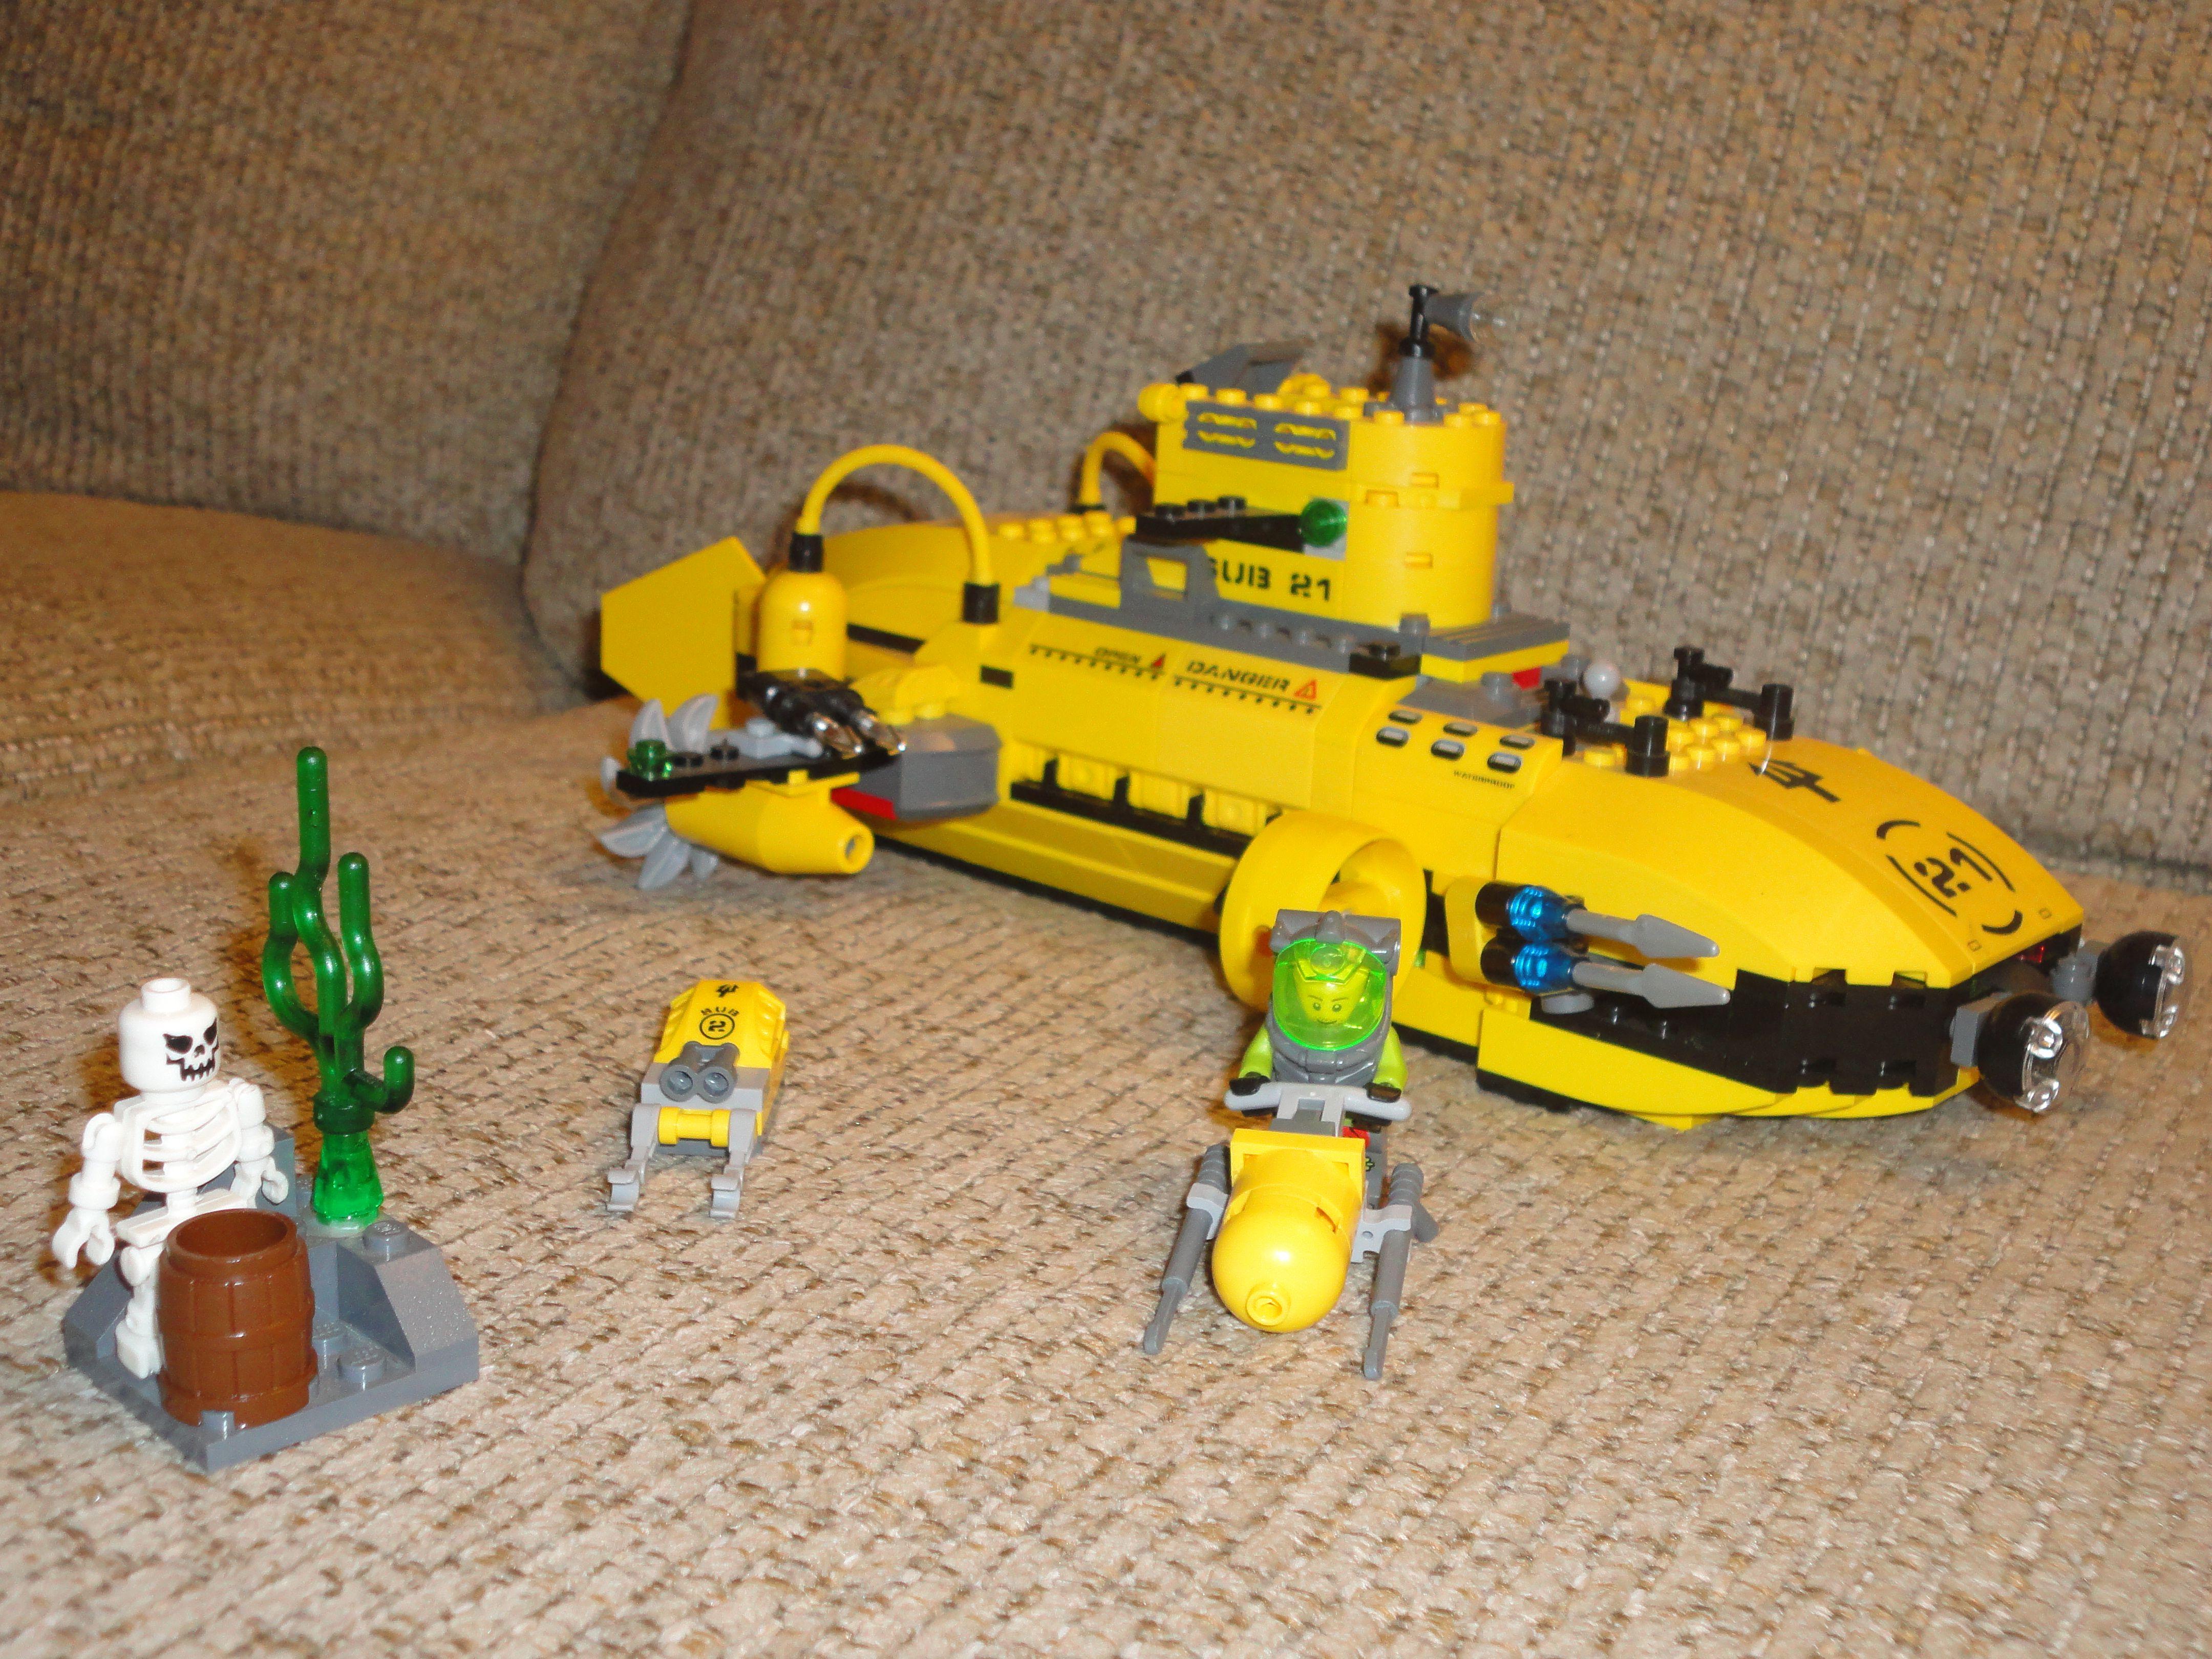 Lego Submarine Lego Submarine Cool Lego Lego City